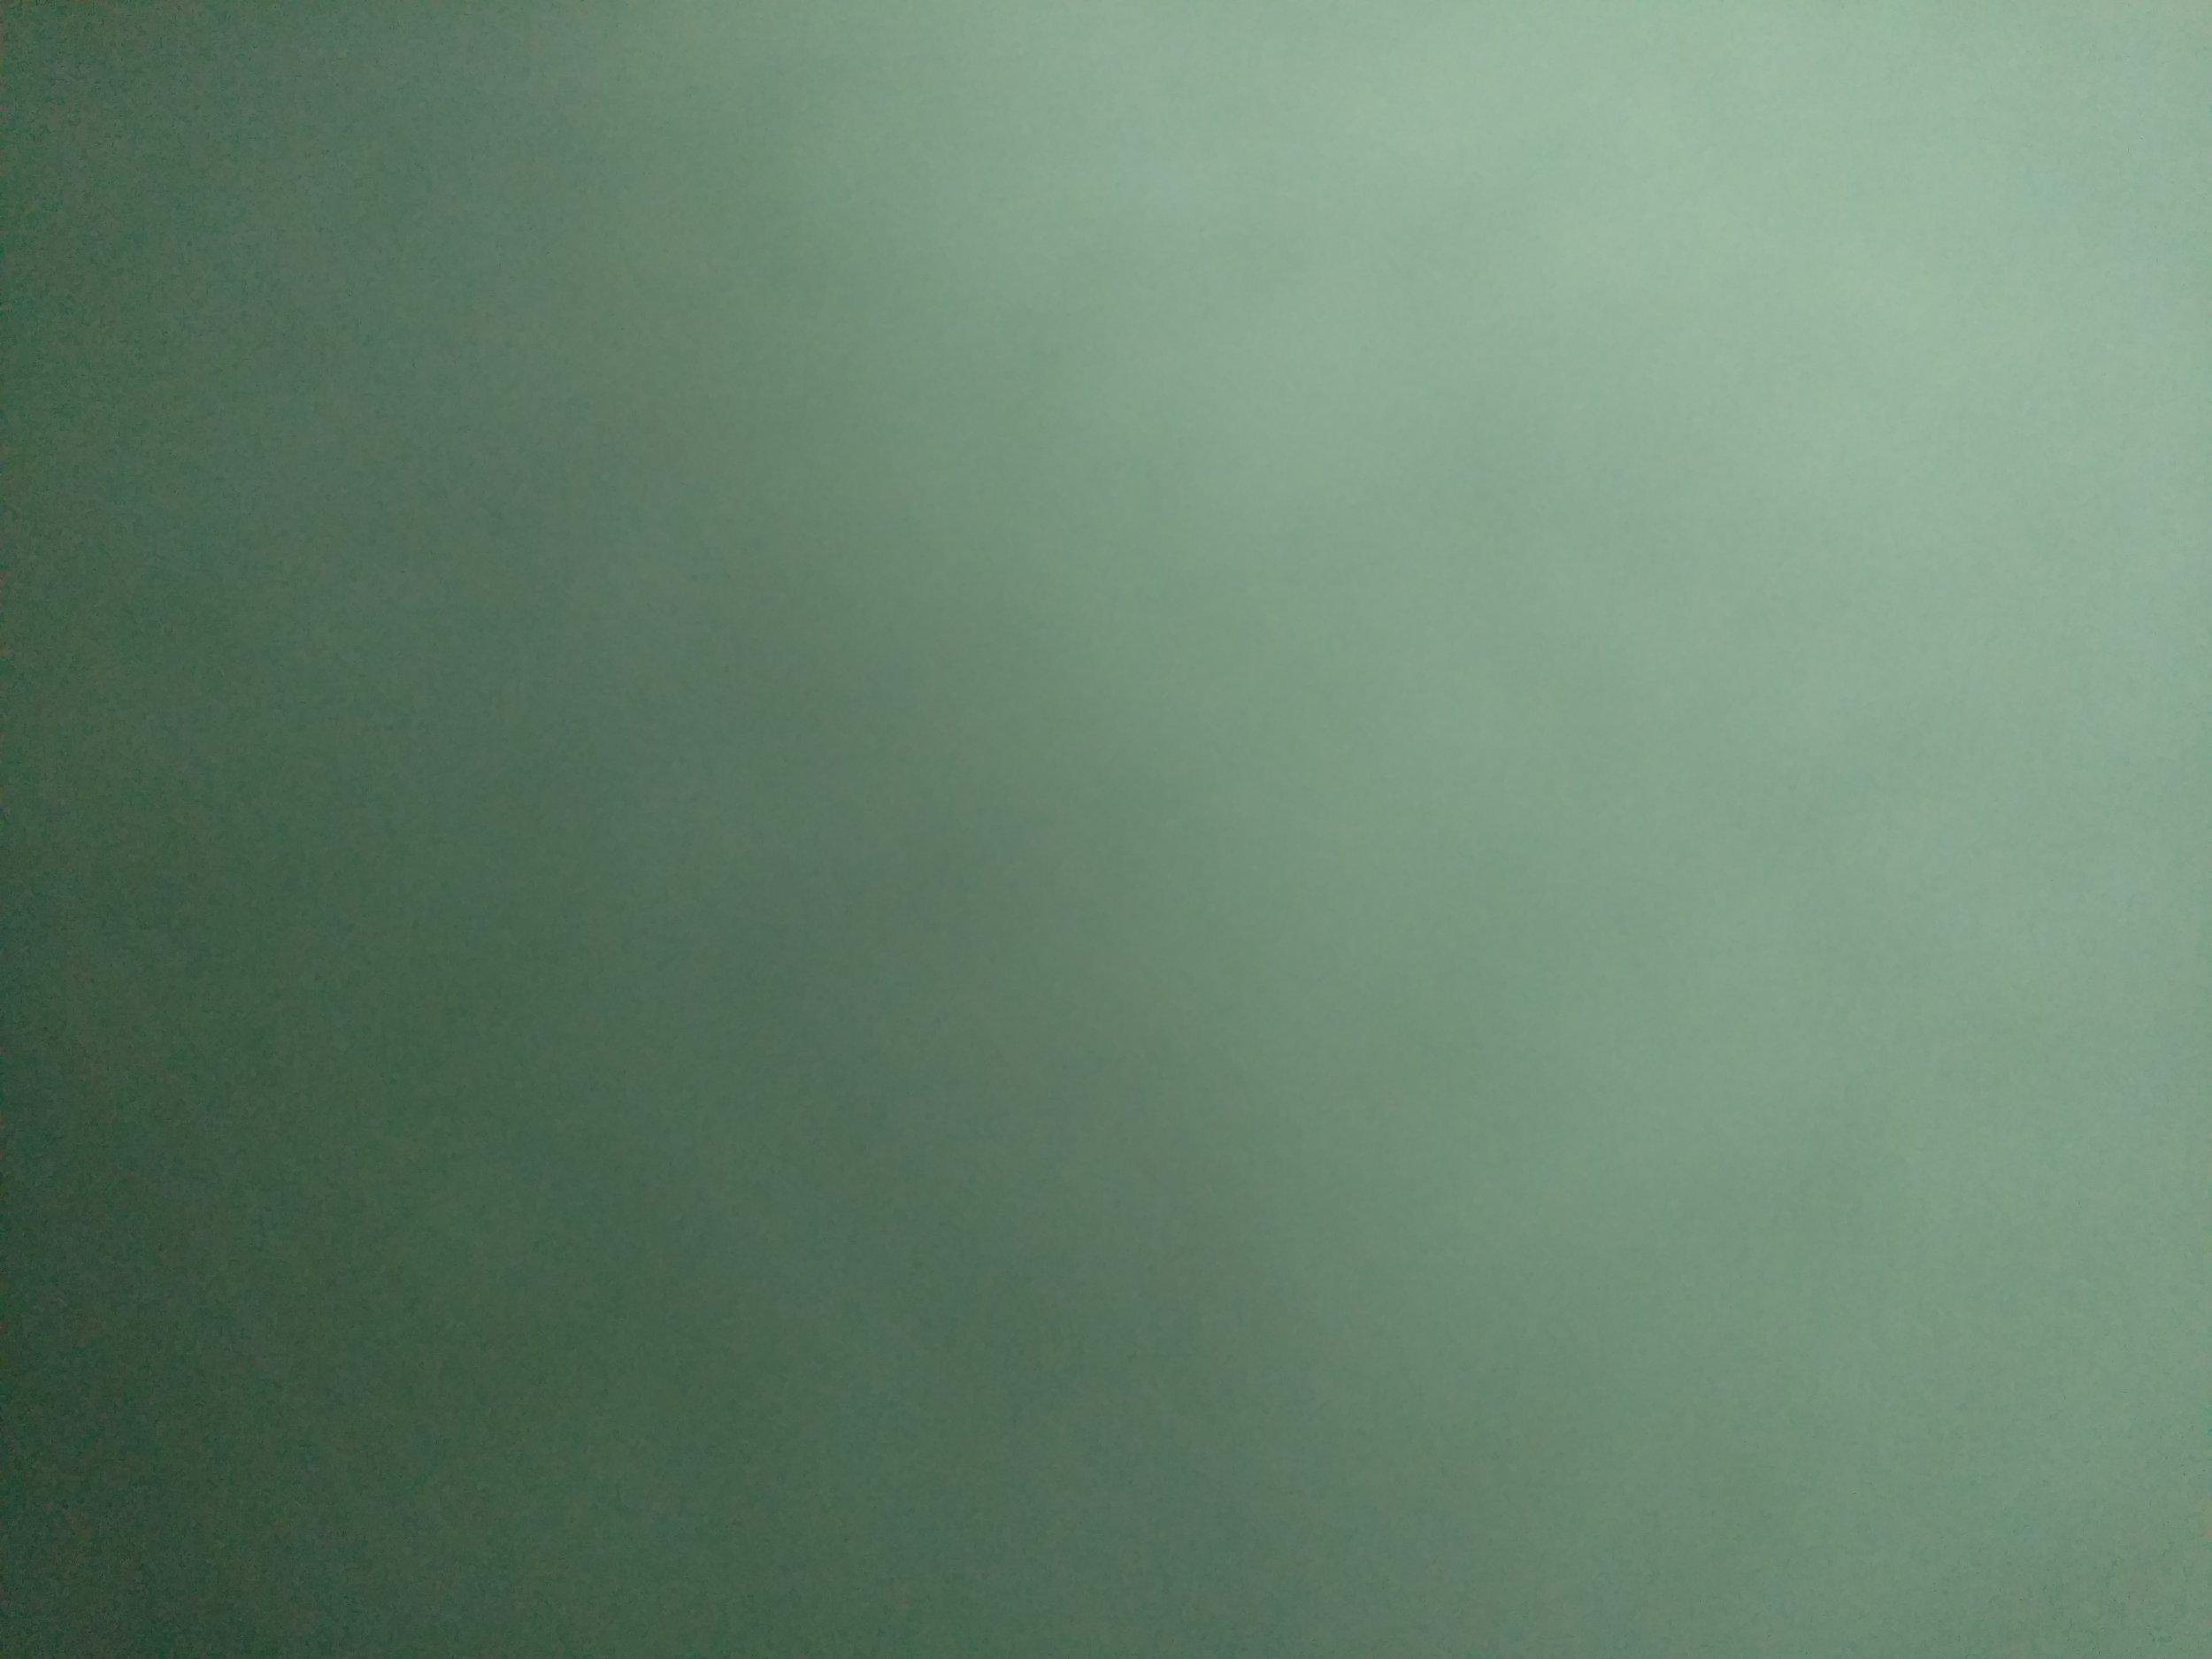 willroth-co-free-texture-gradient-036.jpg